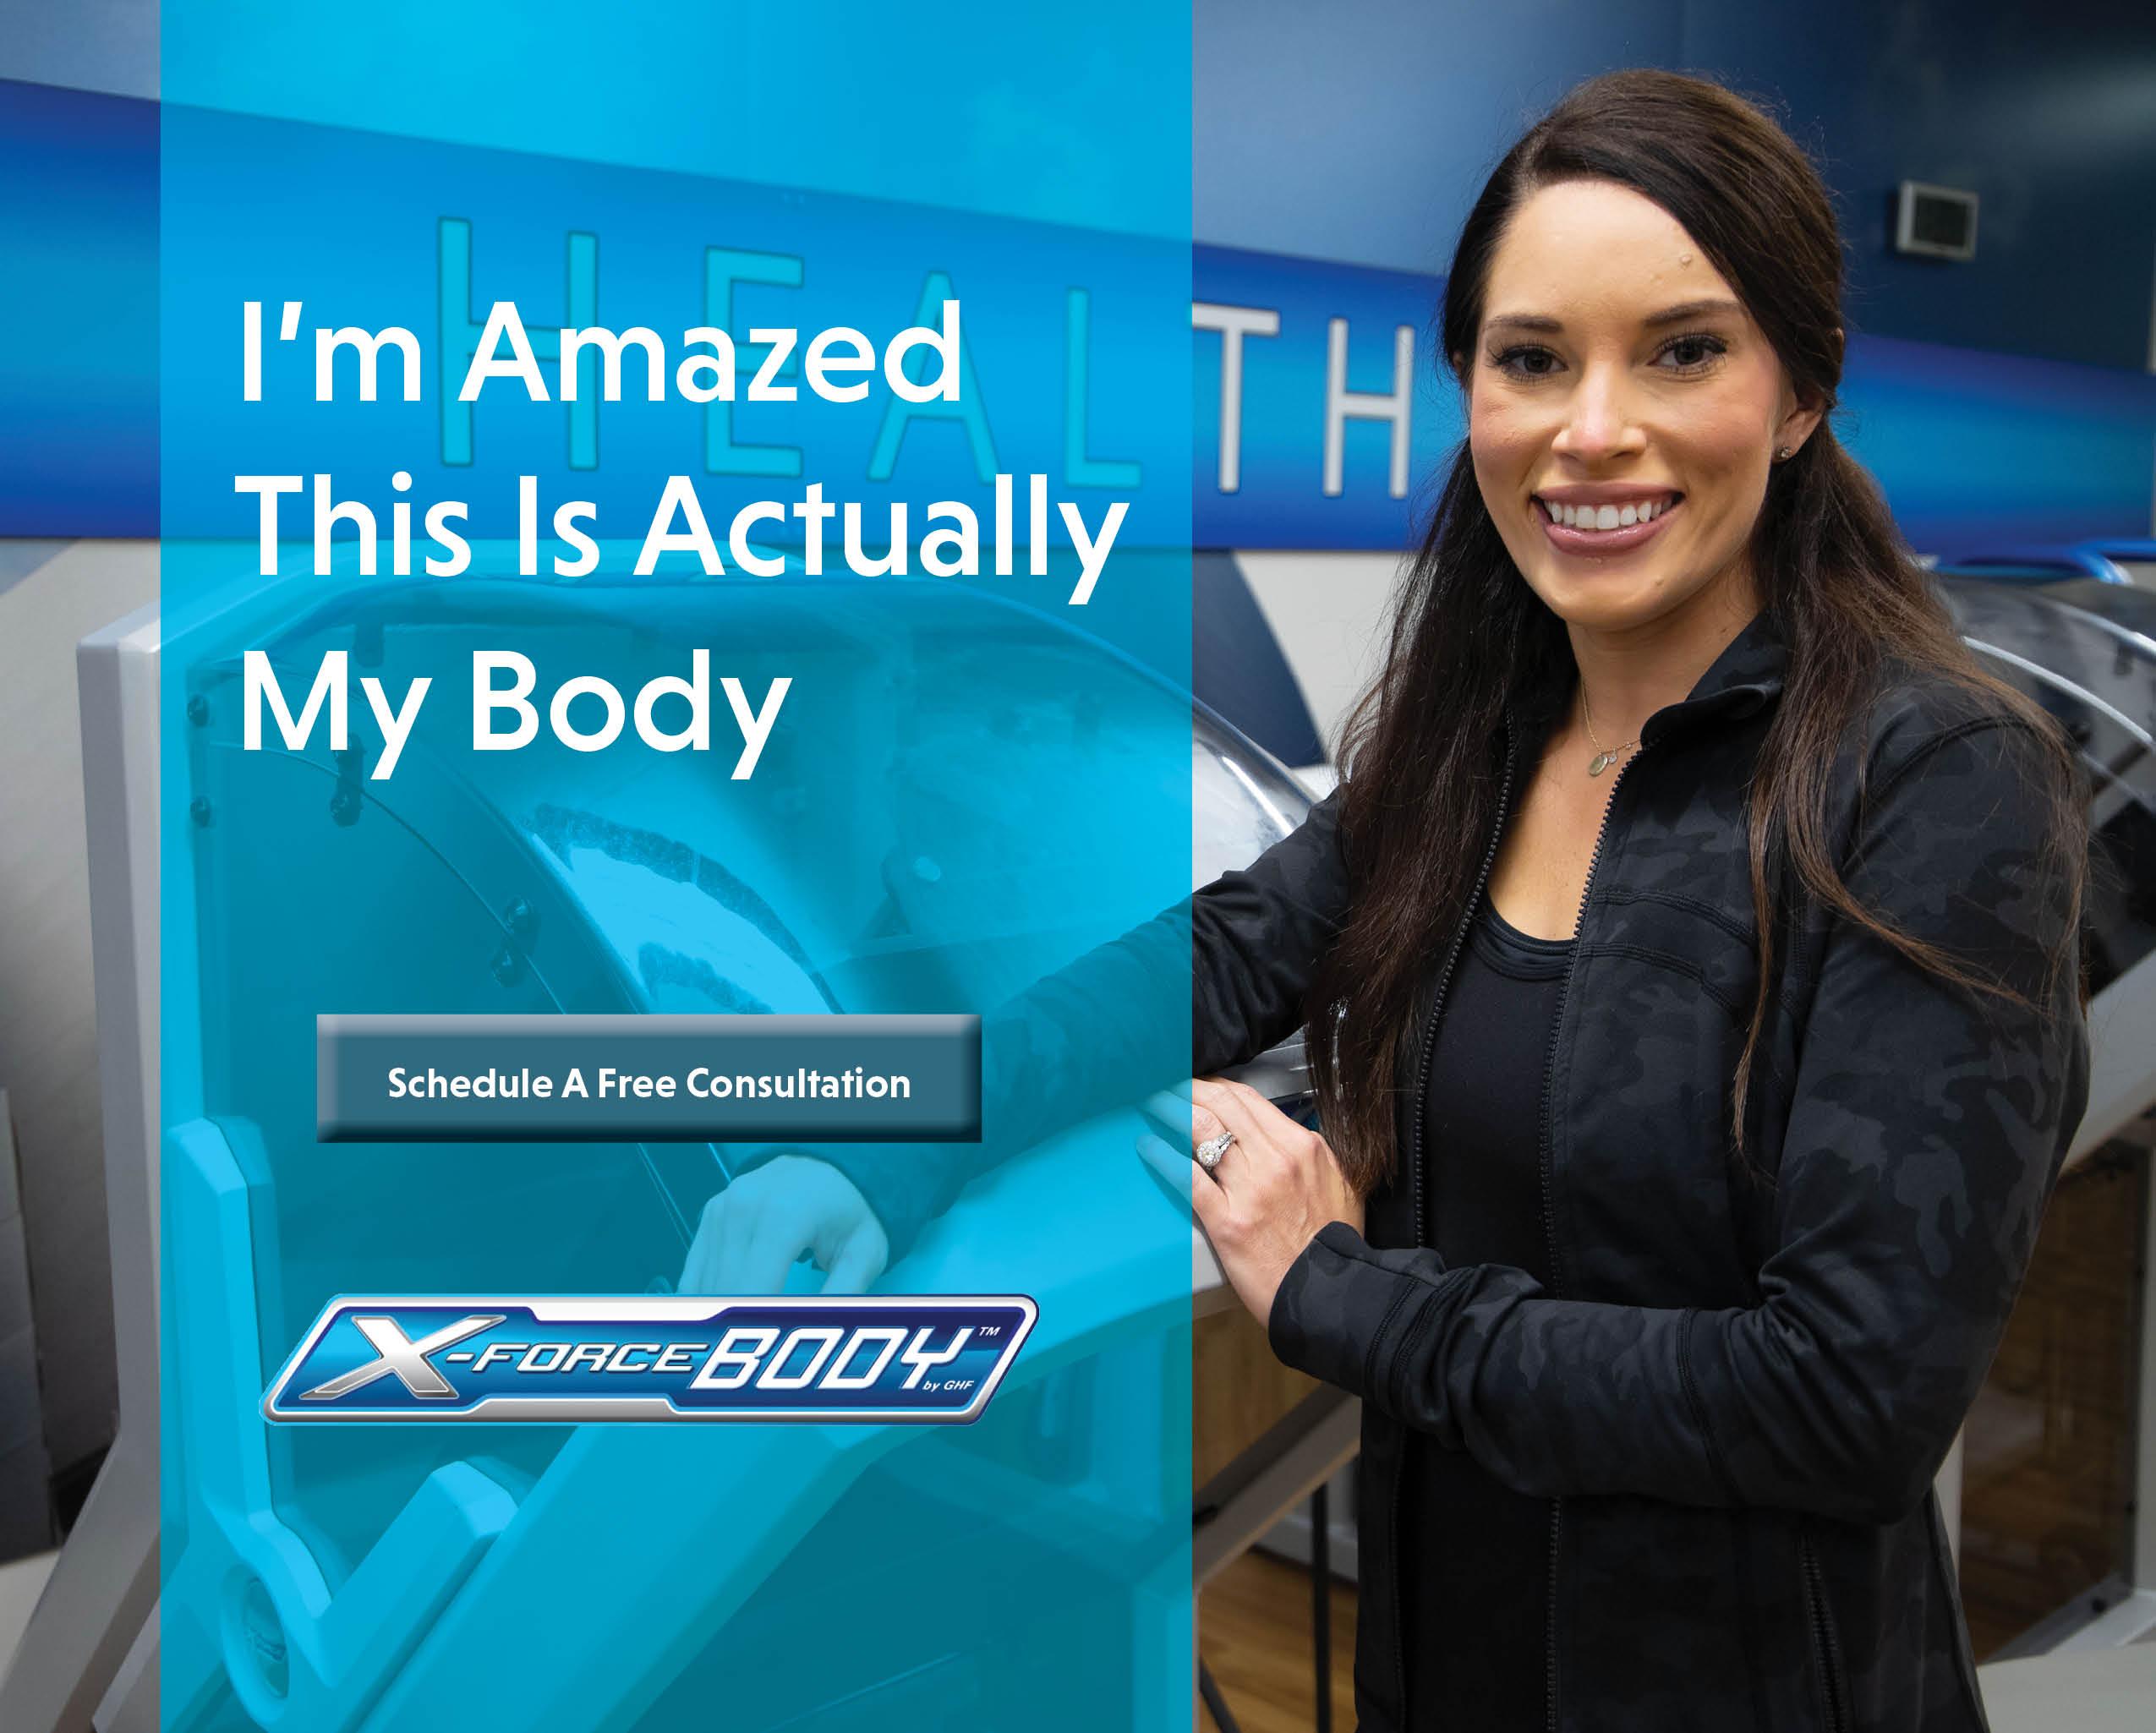 XForce Body